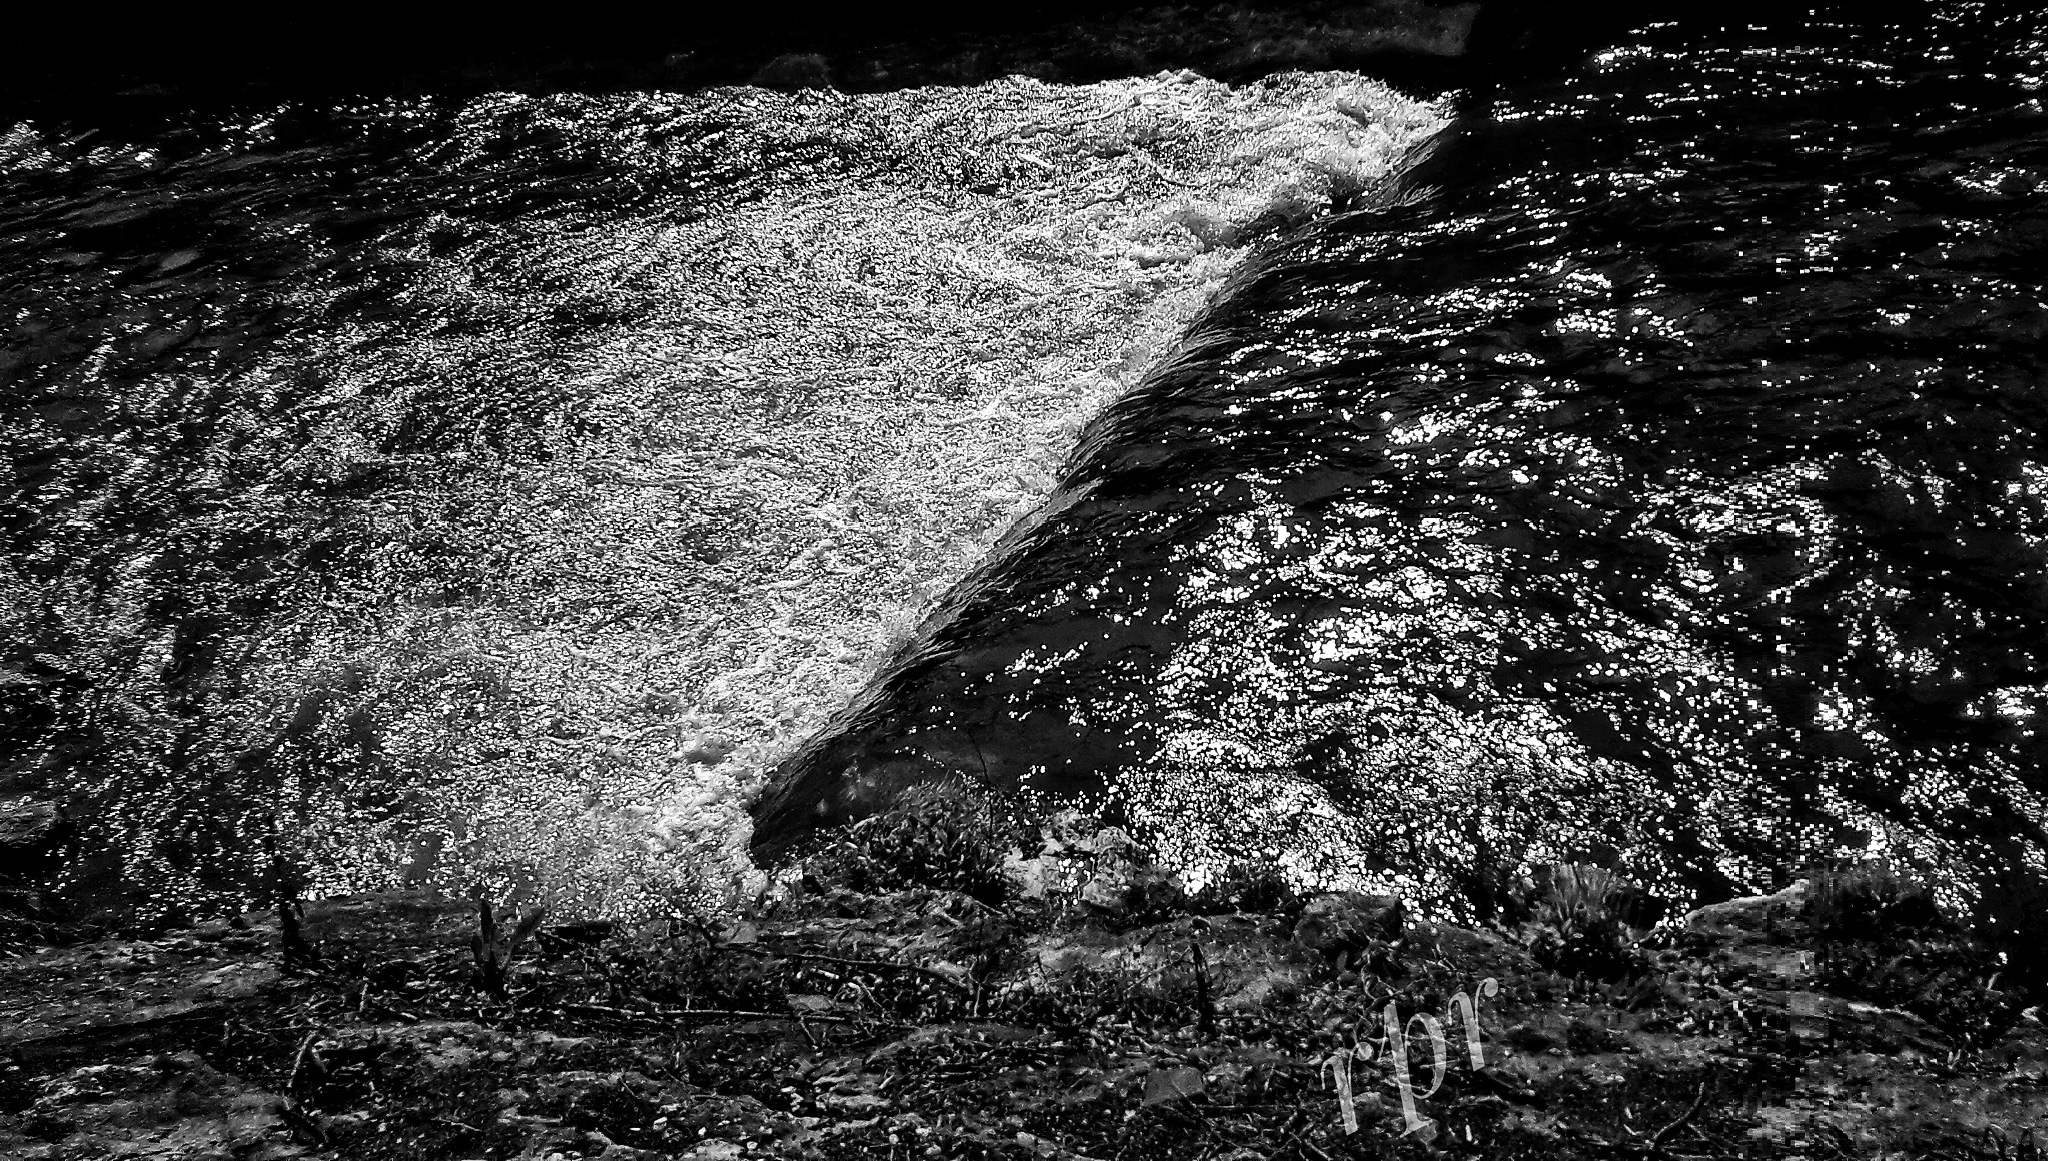 River by  robert pojedinec robert